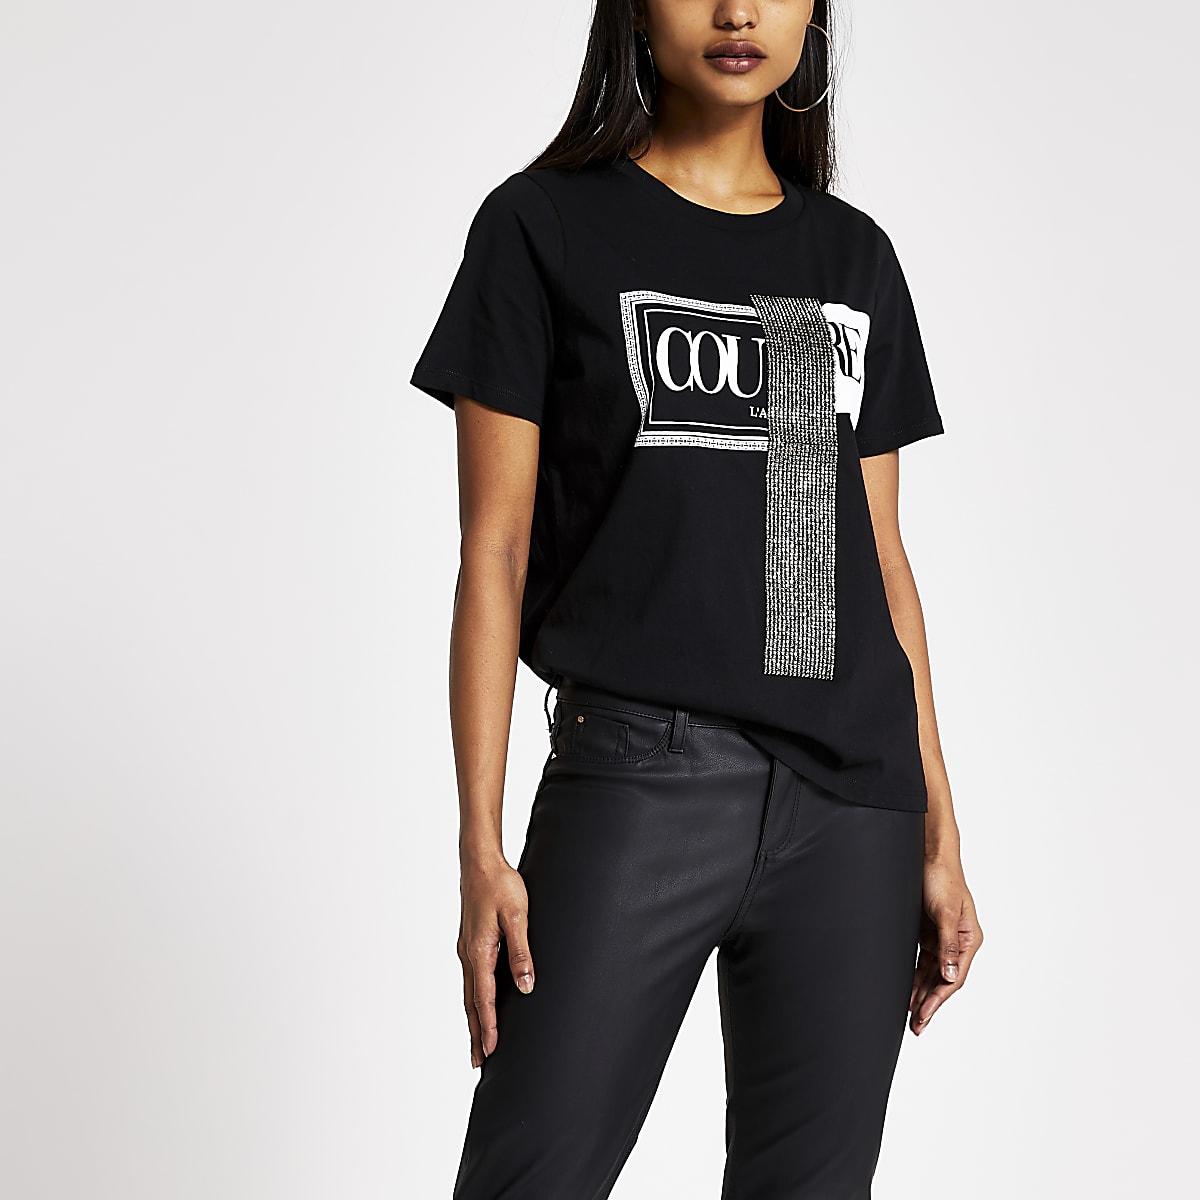 Petite black 'Couture' diamante T-shirt